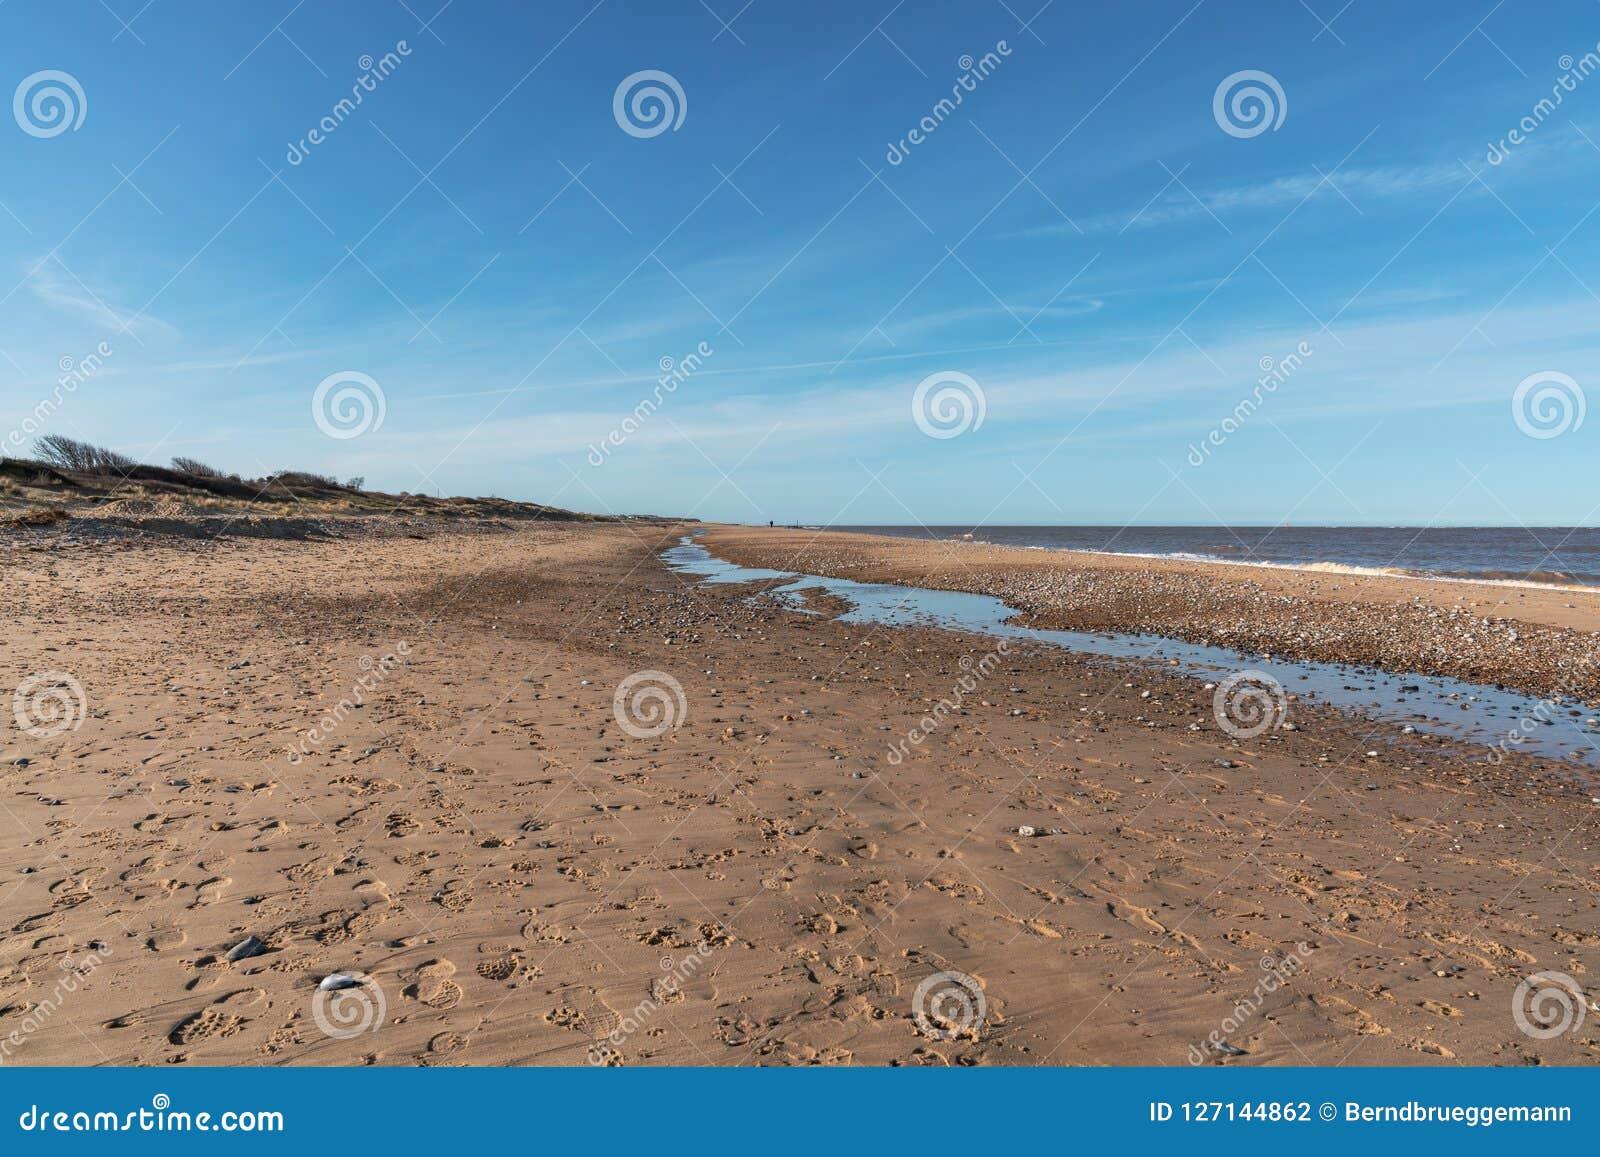 North sea coast in Caister-on-Sea, Norfolk, England, UK